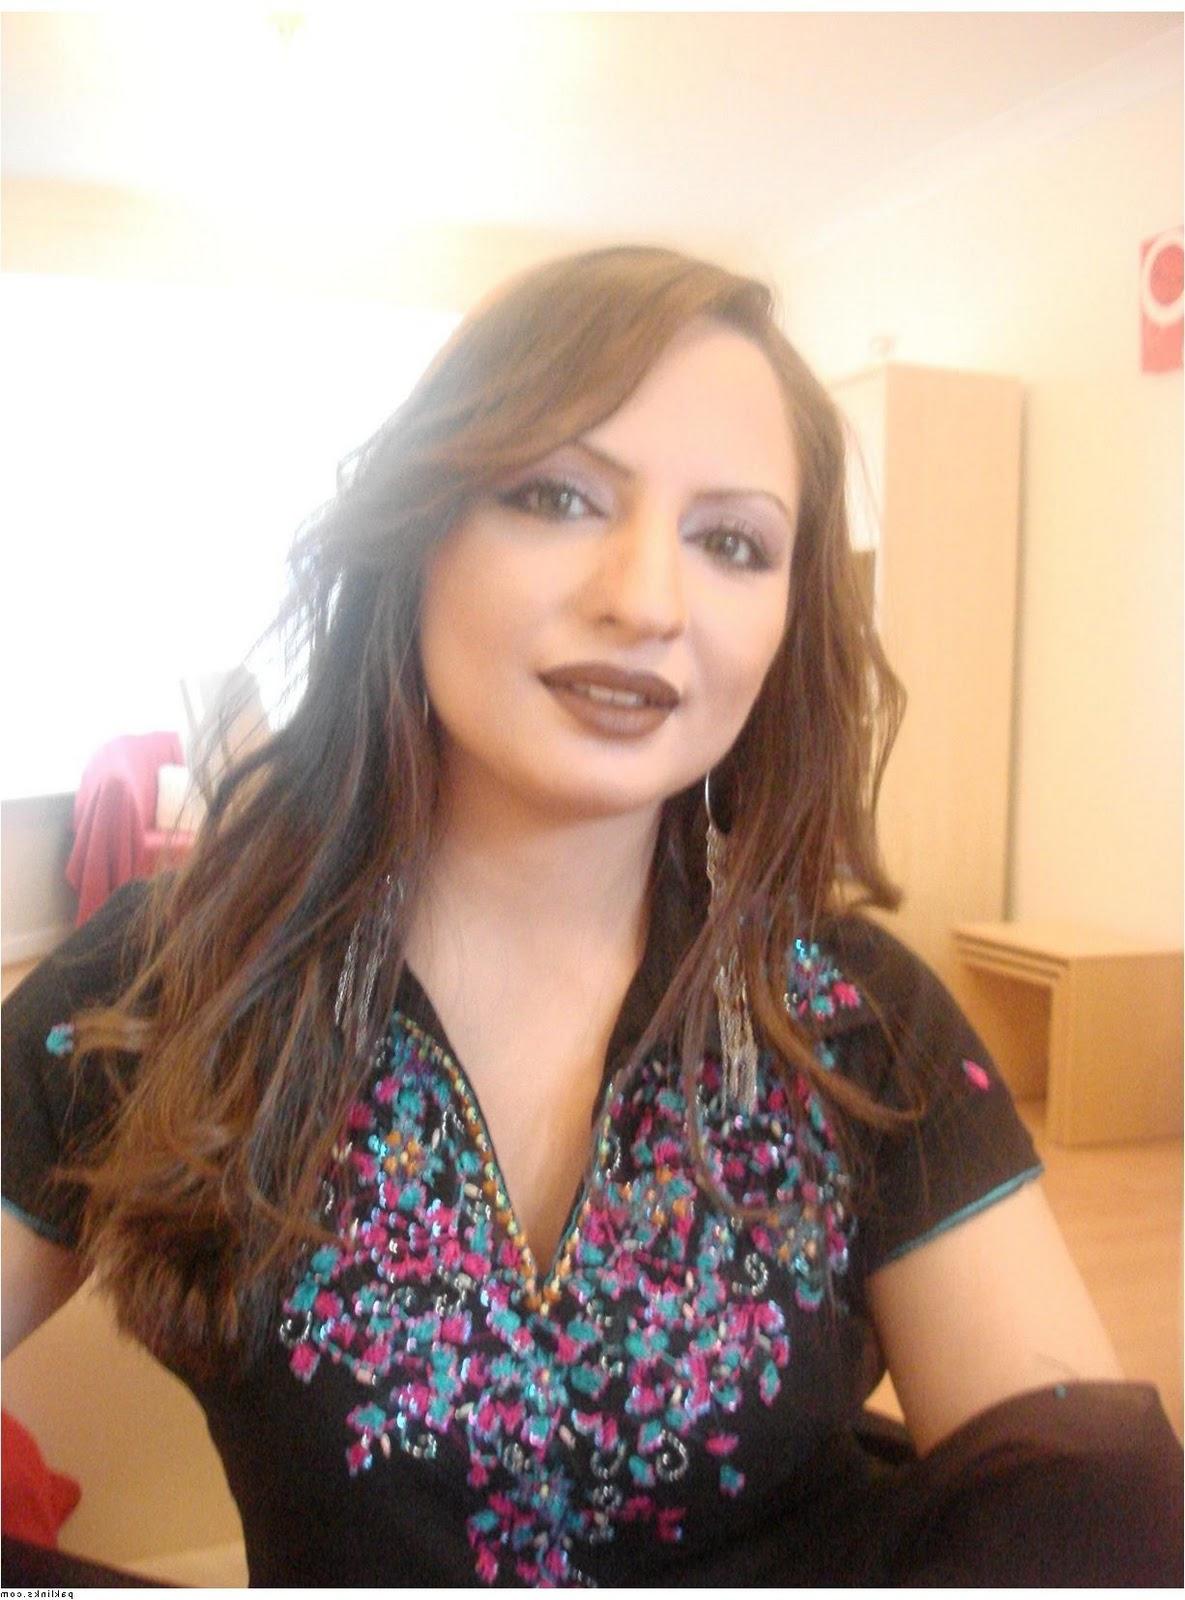 blue shade of eye-makeup